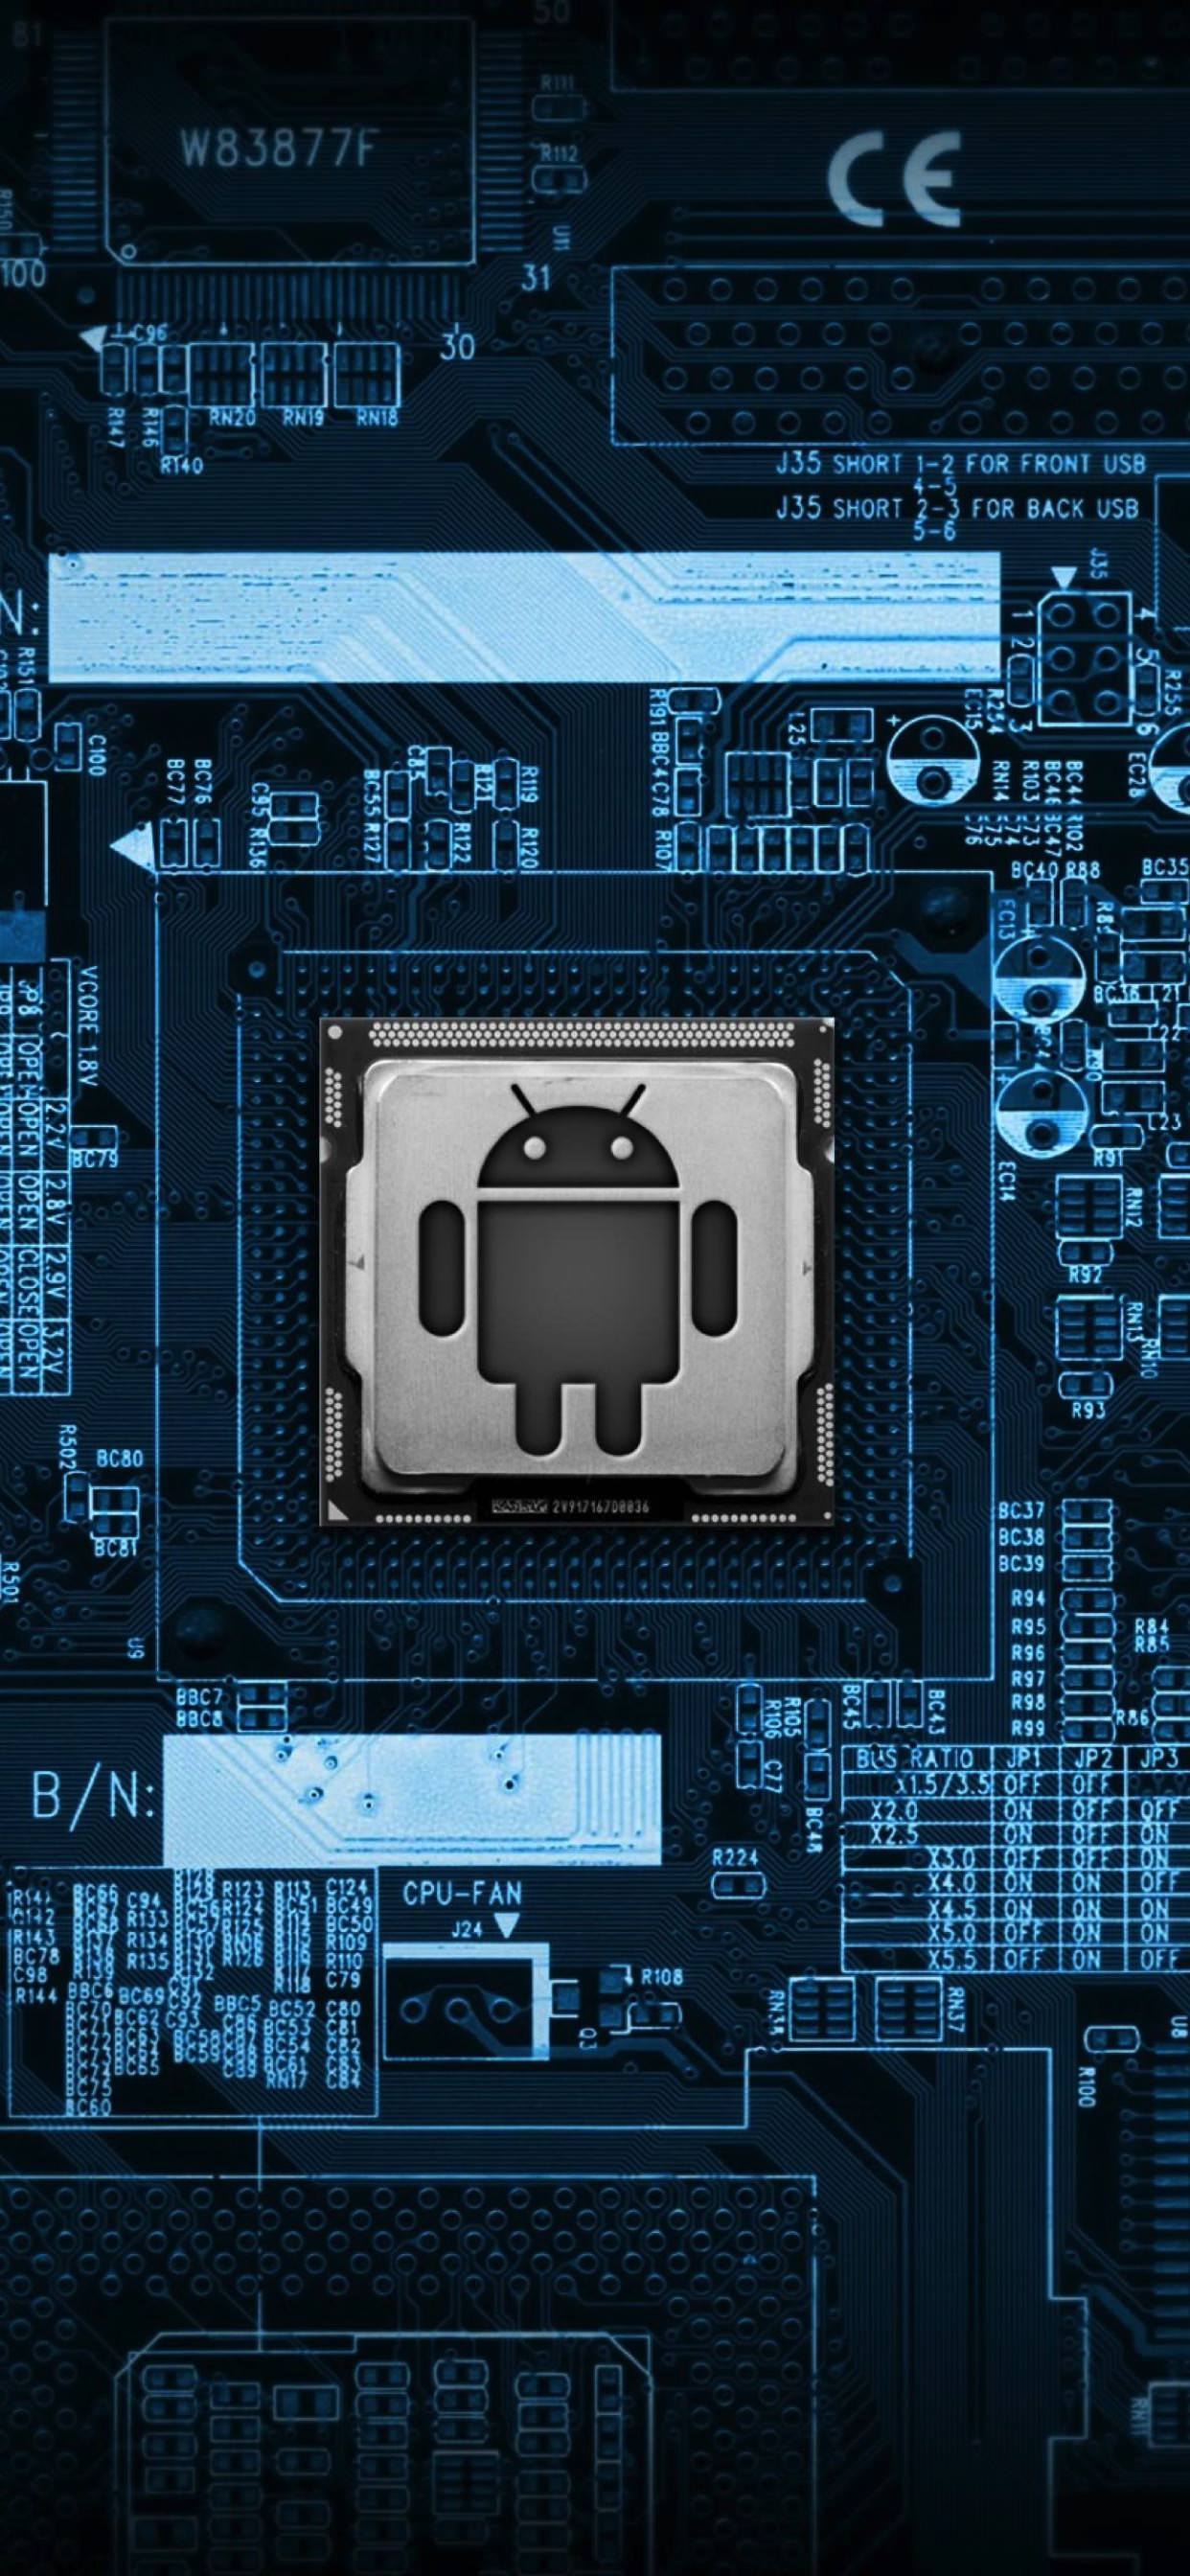 Unduh 600+ Wallpaper Iphone Xs Android HD Terbaru